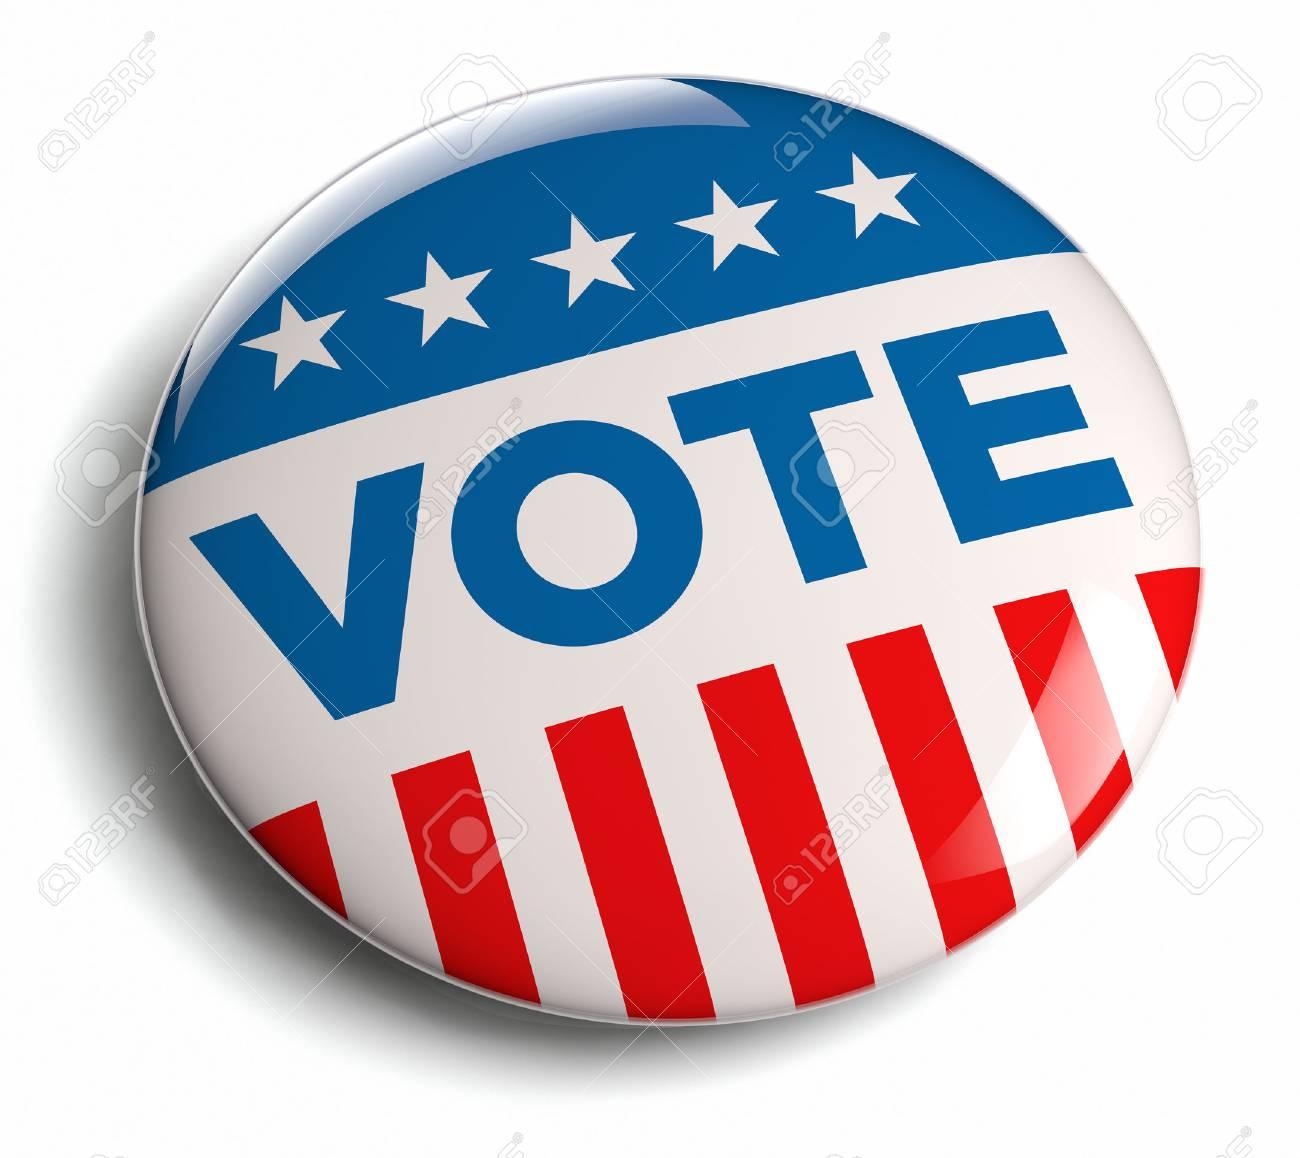 Vote election campaign badge button - 27593269